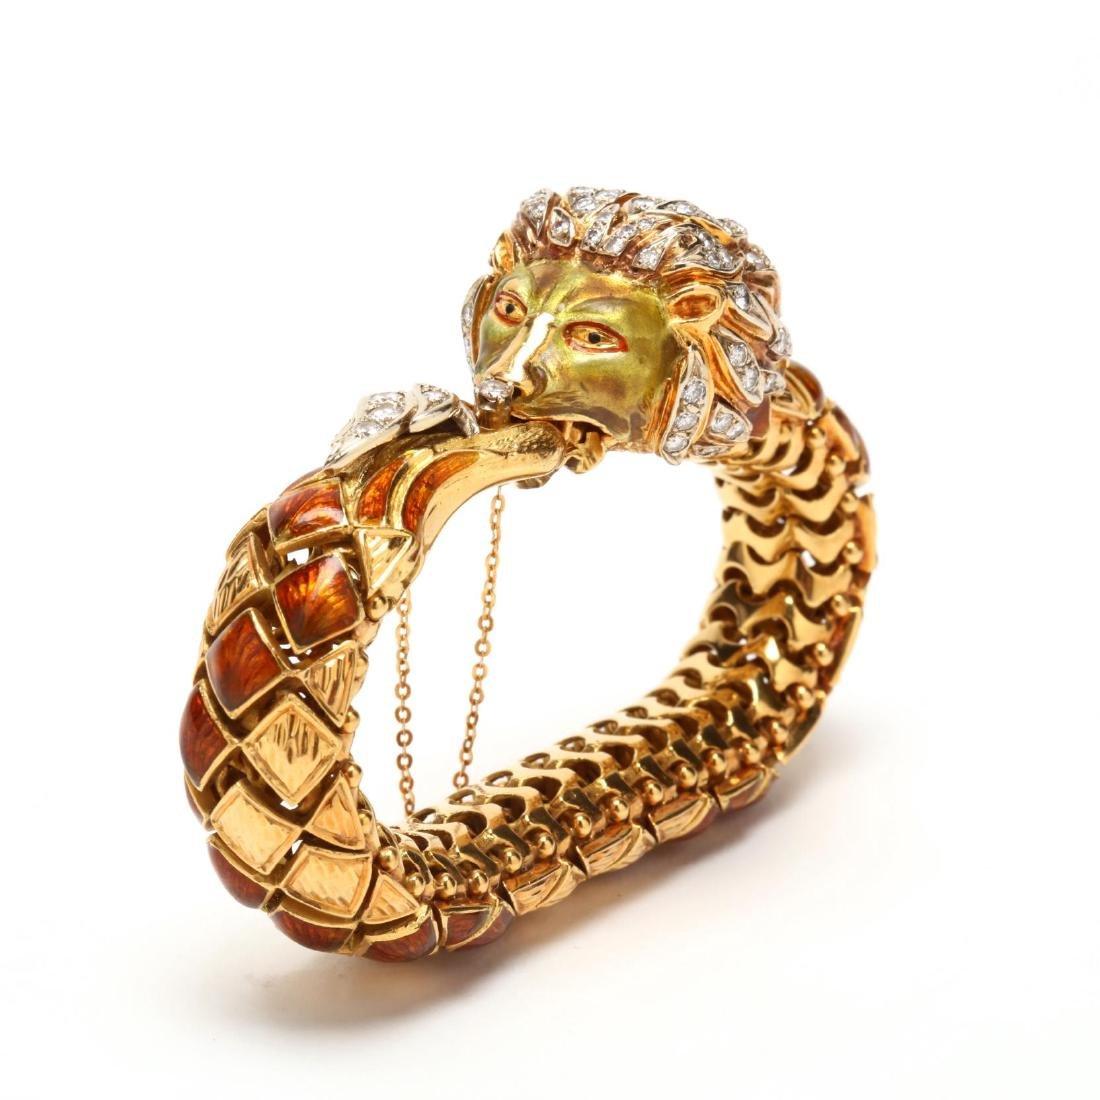 18KT Gold, Diamond, and Enamel Lion's Head Bracelet